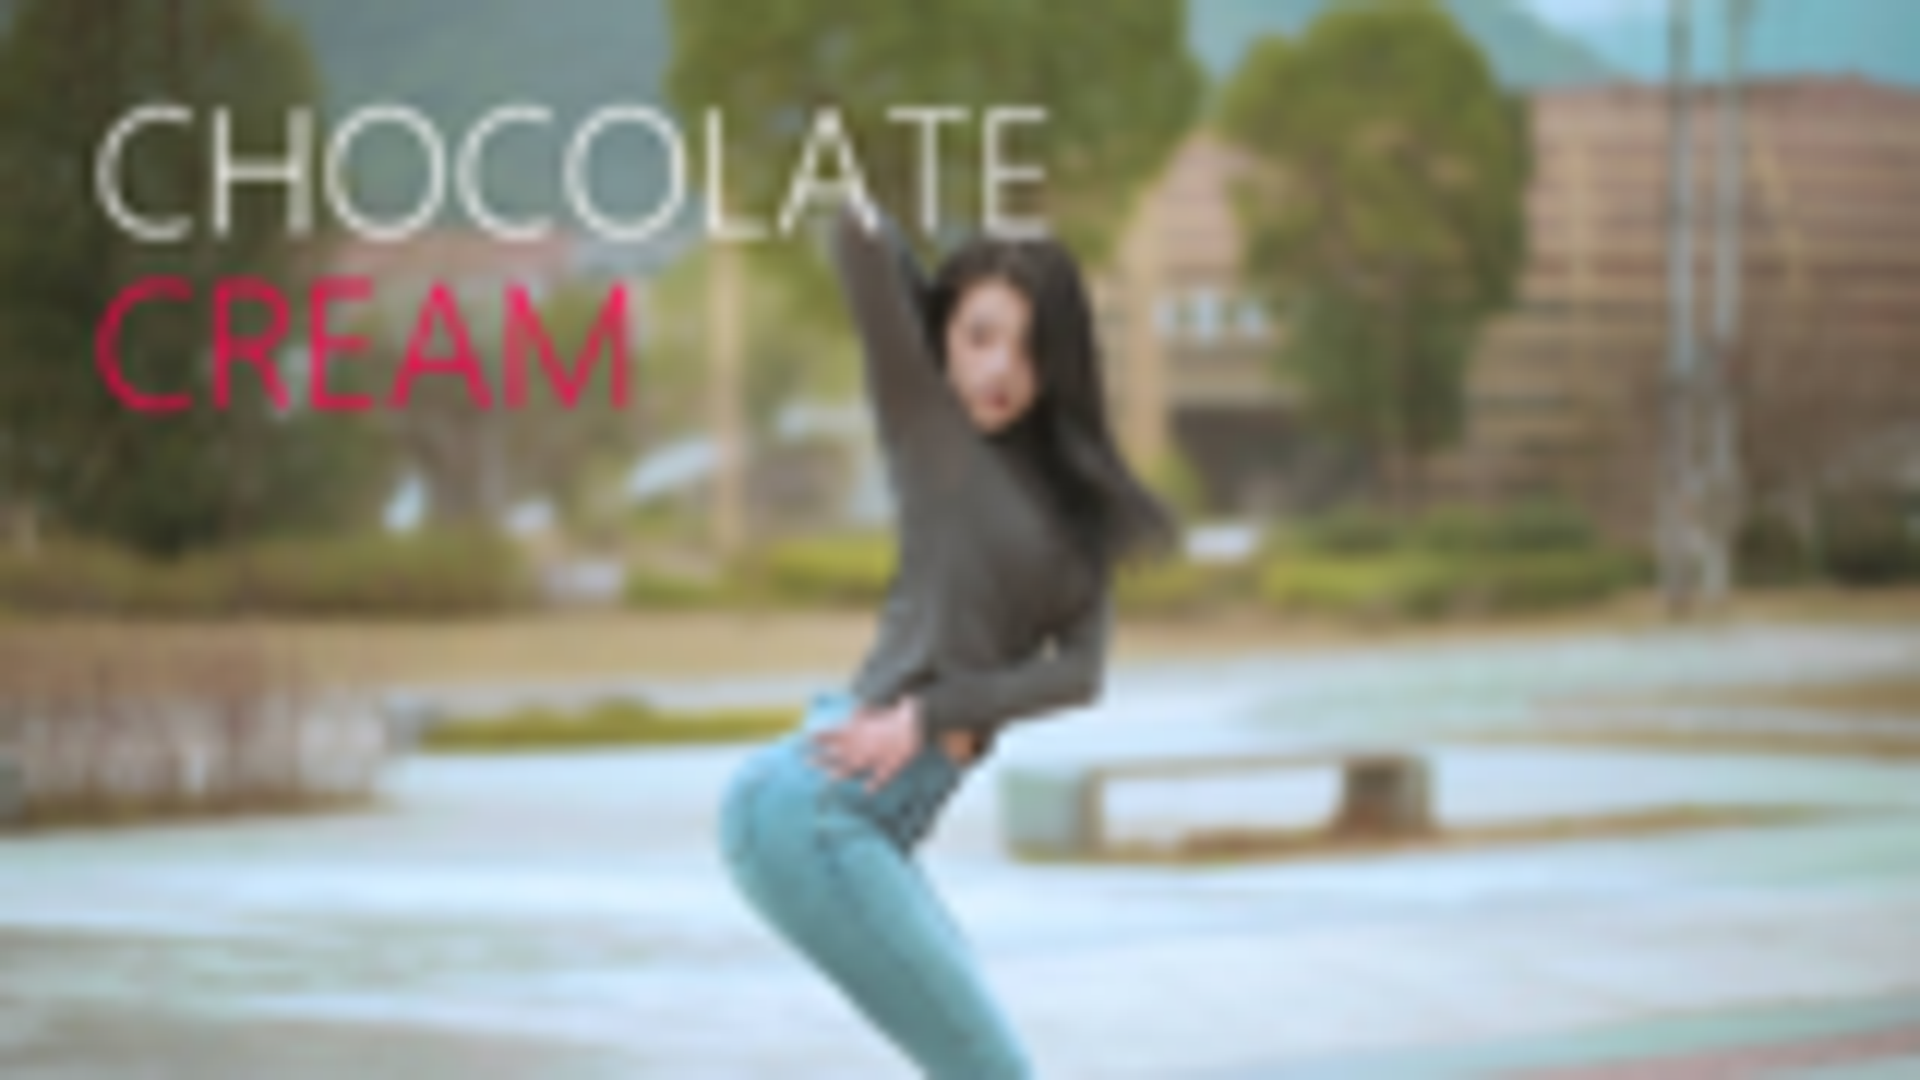 Chocolate Cream【竖屏】我好了你呢?